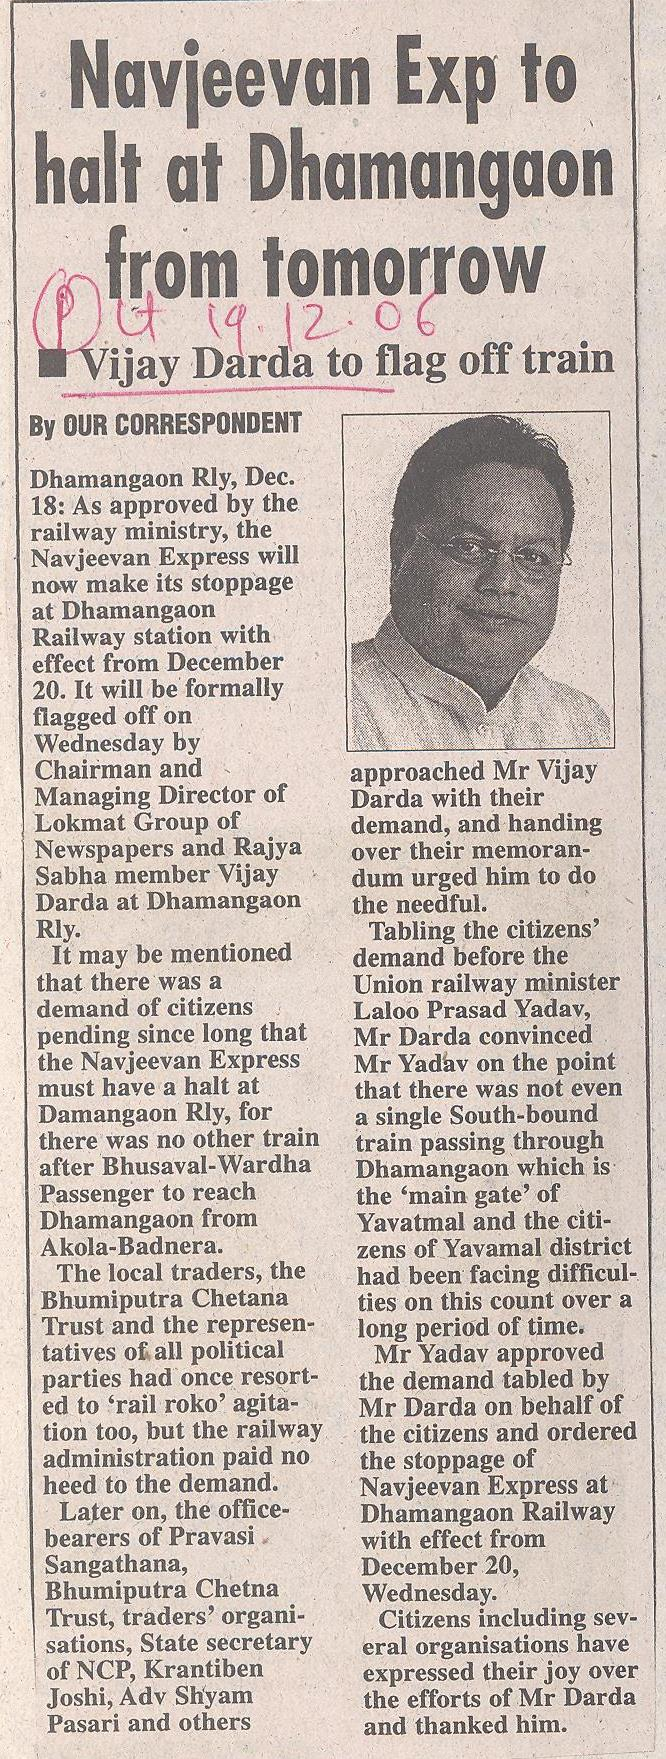 Navjeevan Exp to halt at Dhamangaon from tomorrow